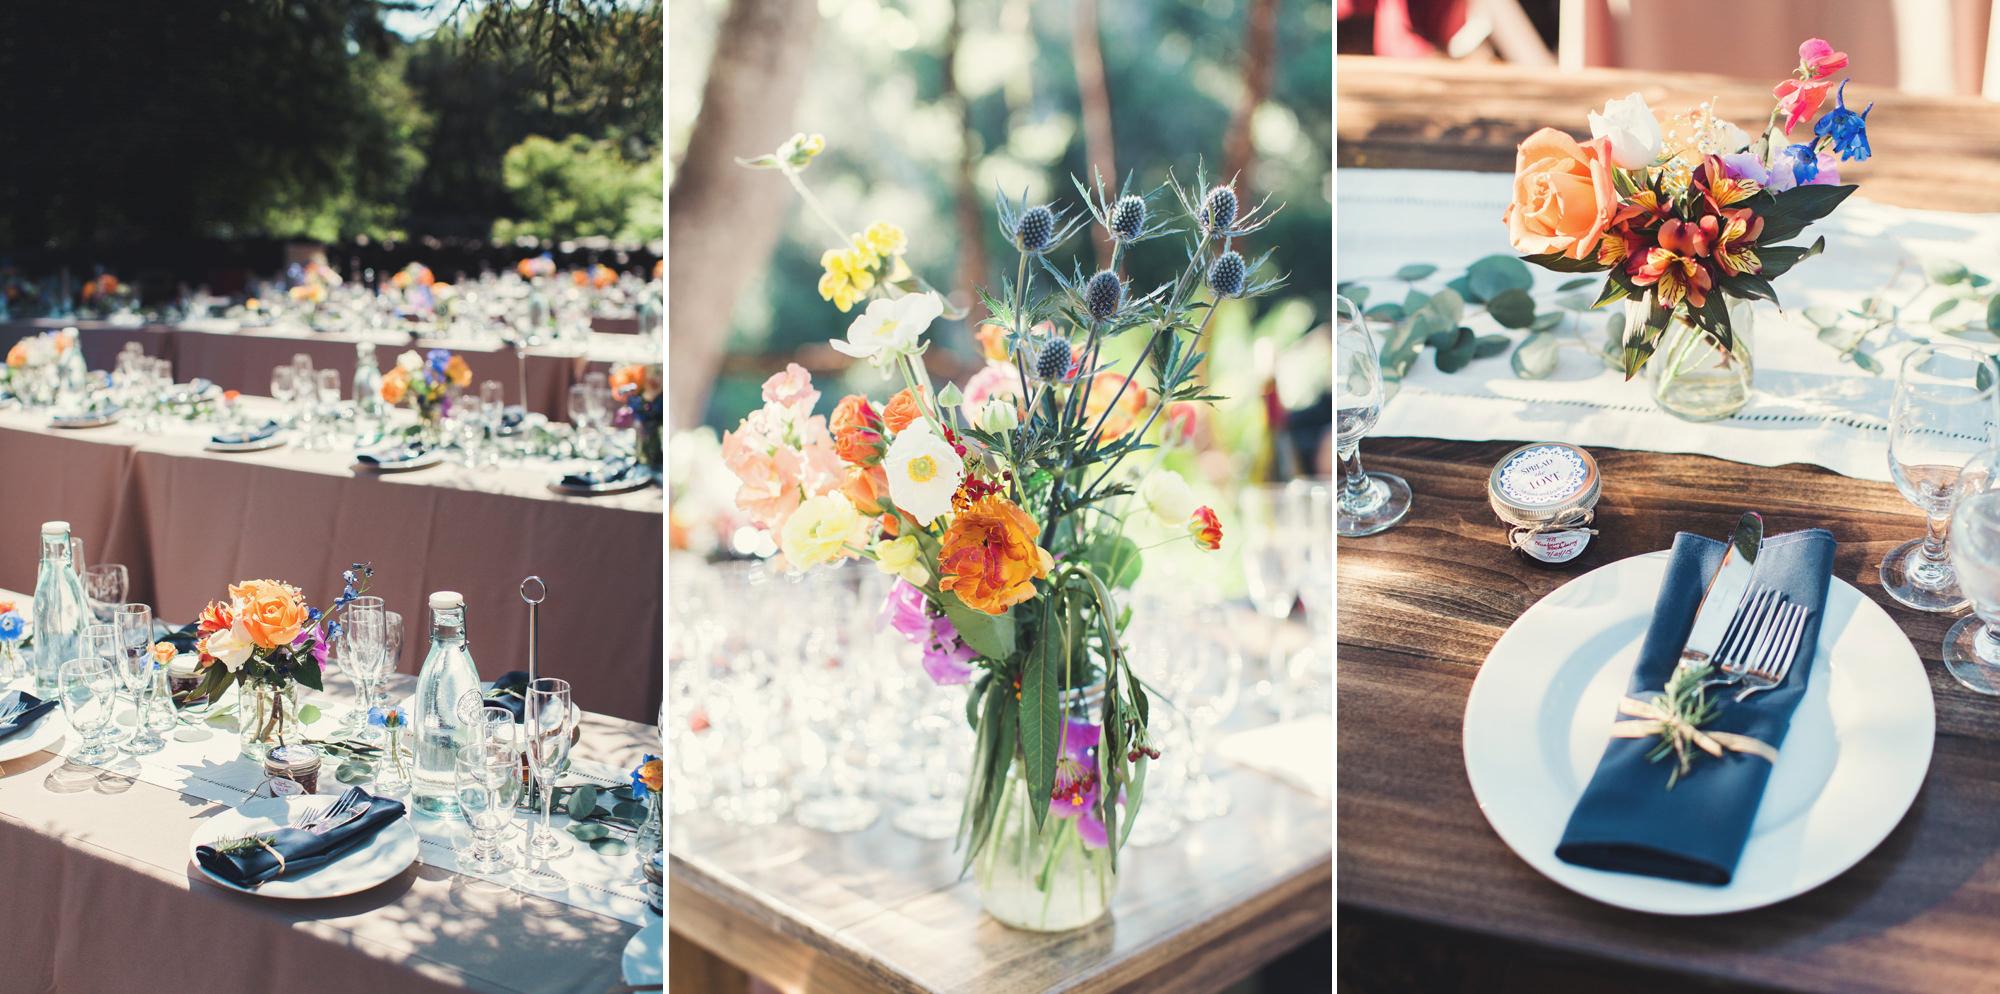 Backyard Wedding in California©Anne-Claire Brun 0019